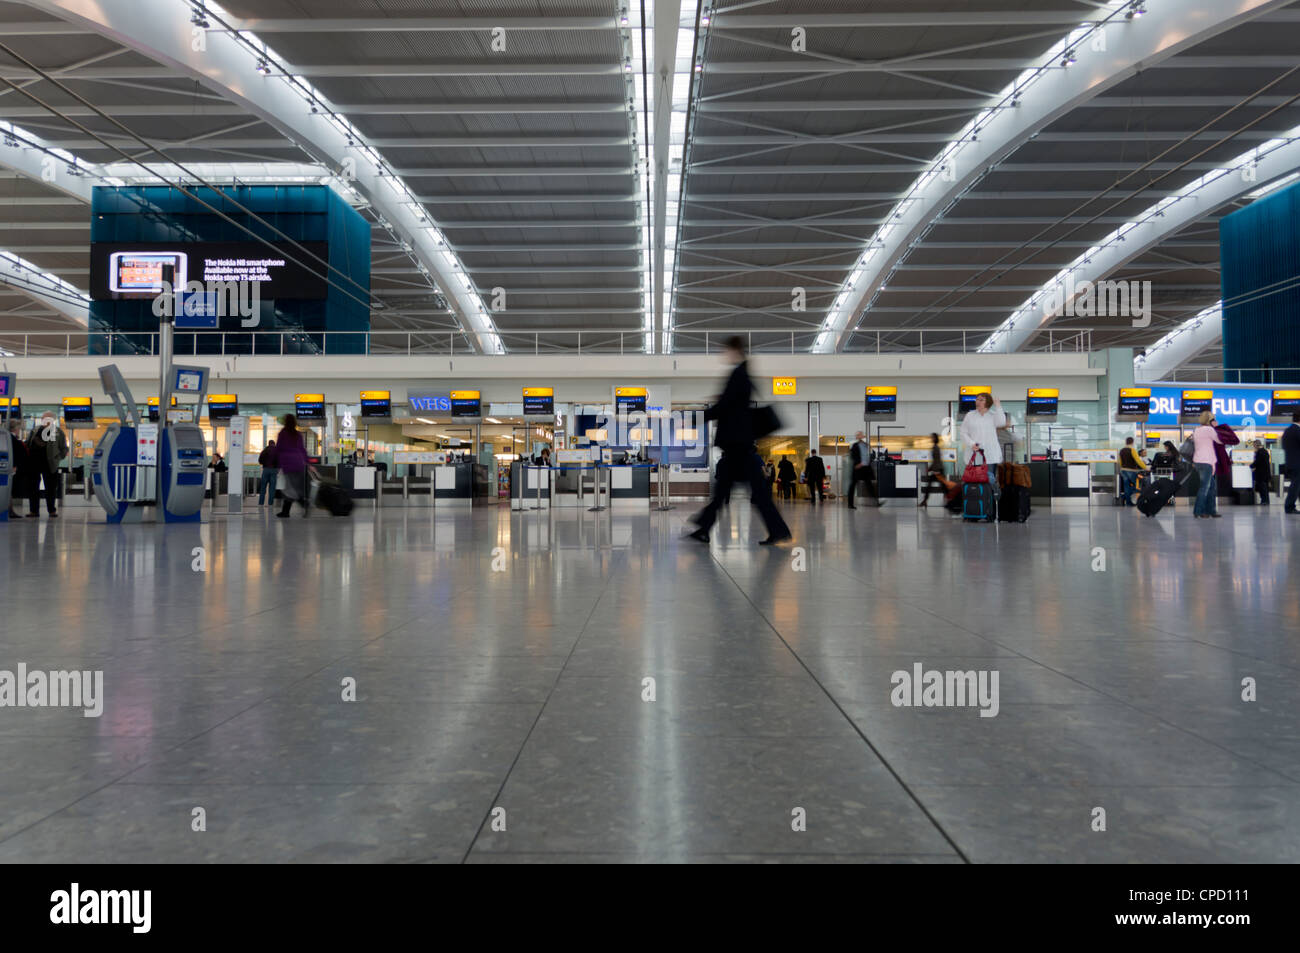 Heathrow Airport Terminal 5 interior, London, England, United Kingdom, Europe - Stock Image